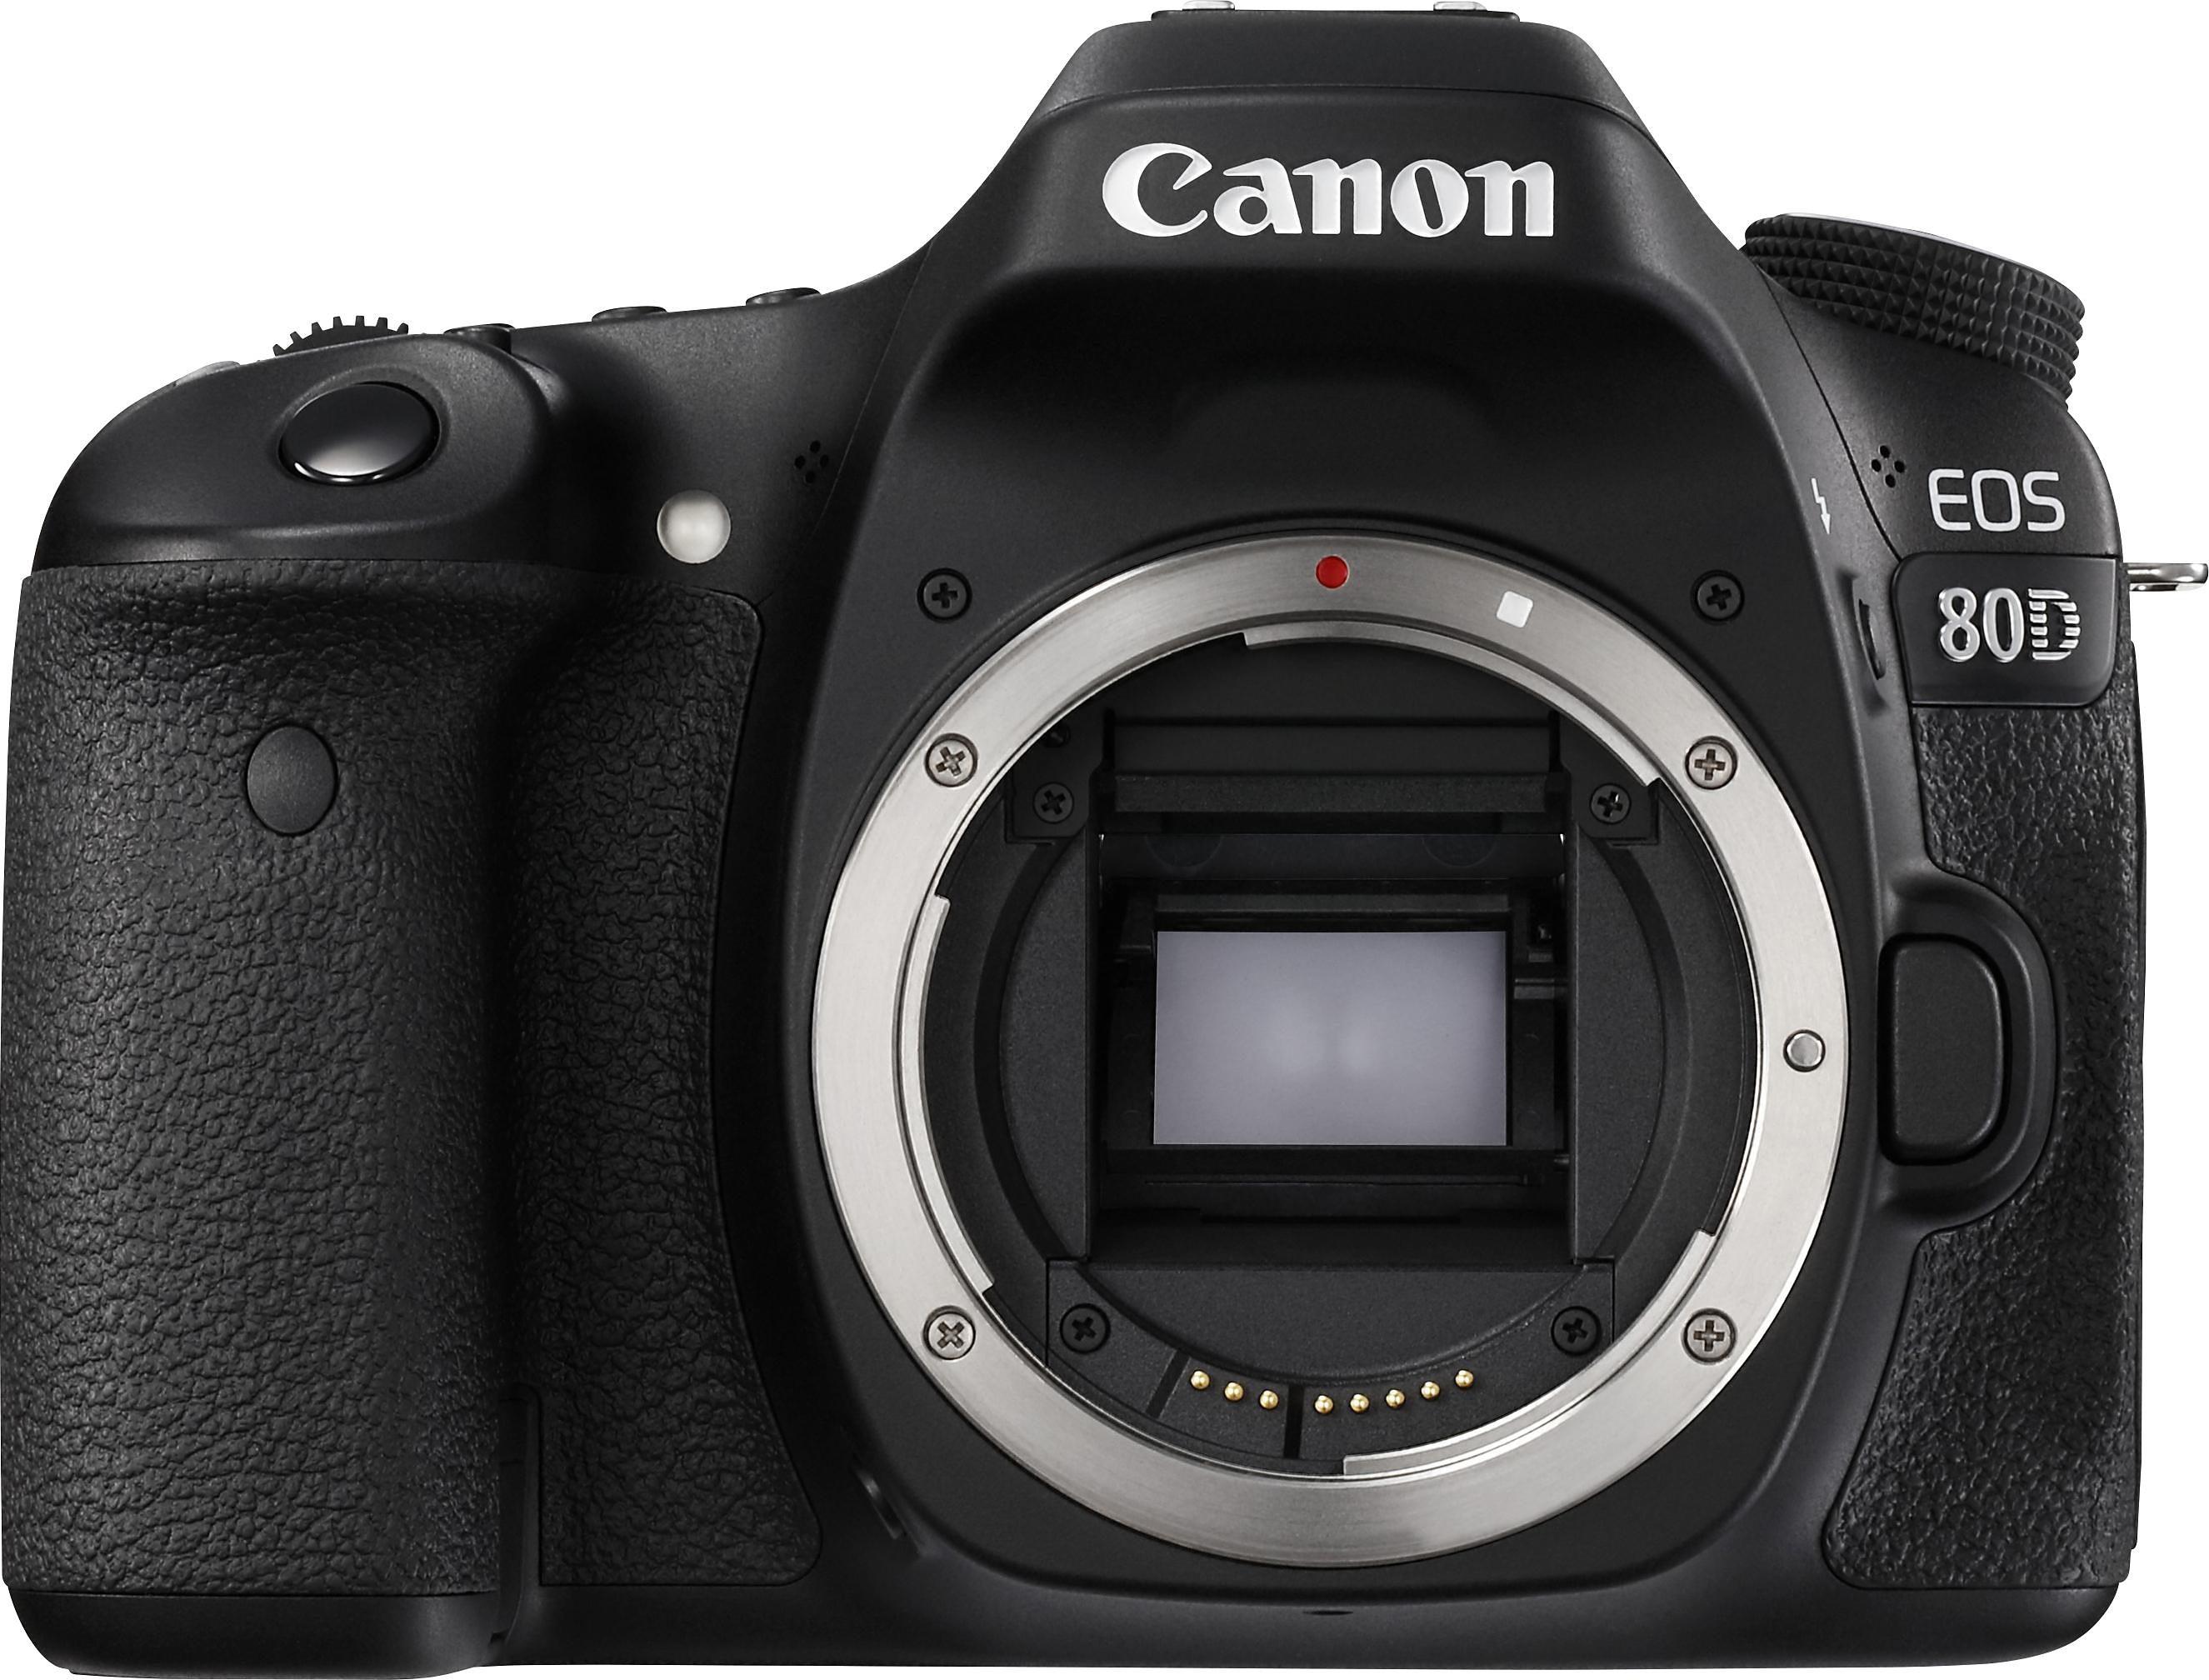 Canon EOS 80D Body Spiegelreflex Kamera, 24,2 Megapixel, 7,7 cm (3 Zoll) Display